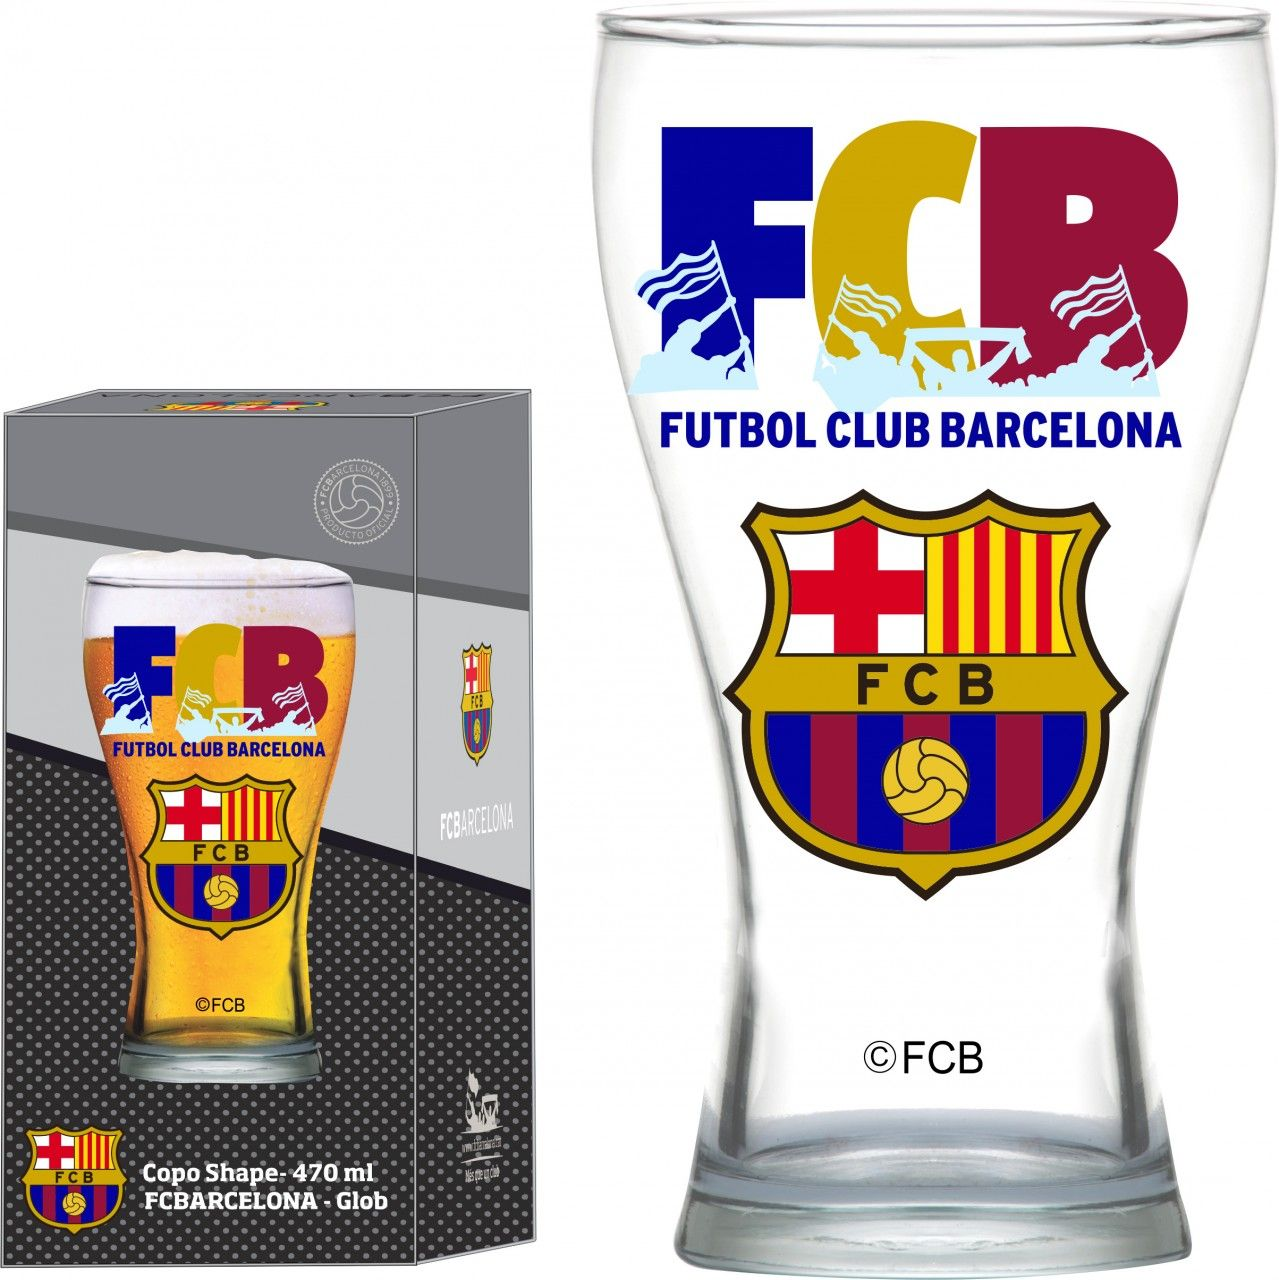 Copo Shape Barcelona FCB - 470ml